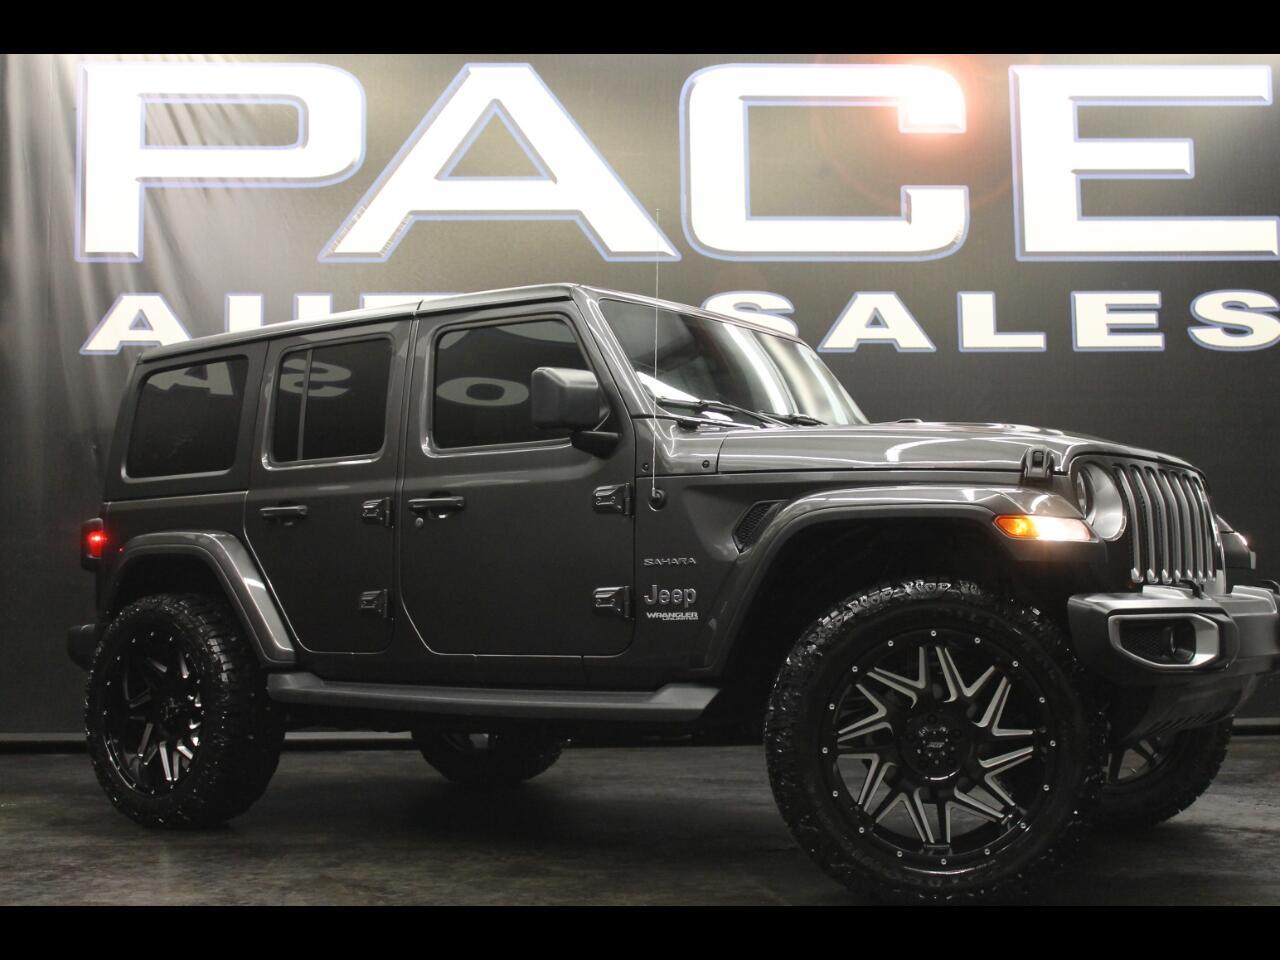 2019 Jeep Wrangler Unlimited Sahara 4WD Lifted Custom